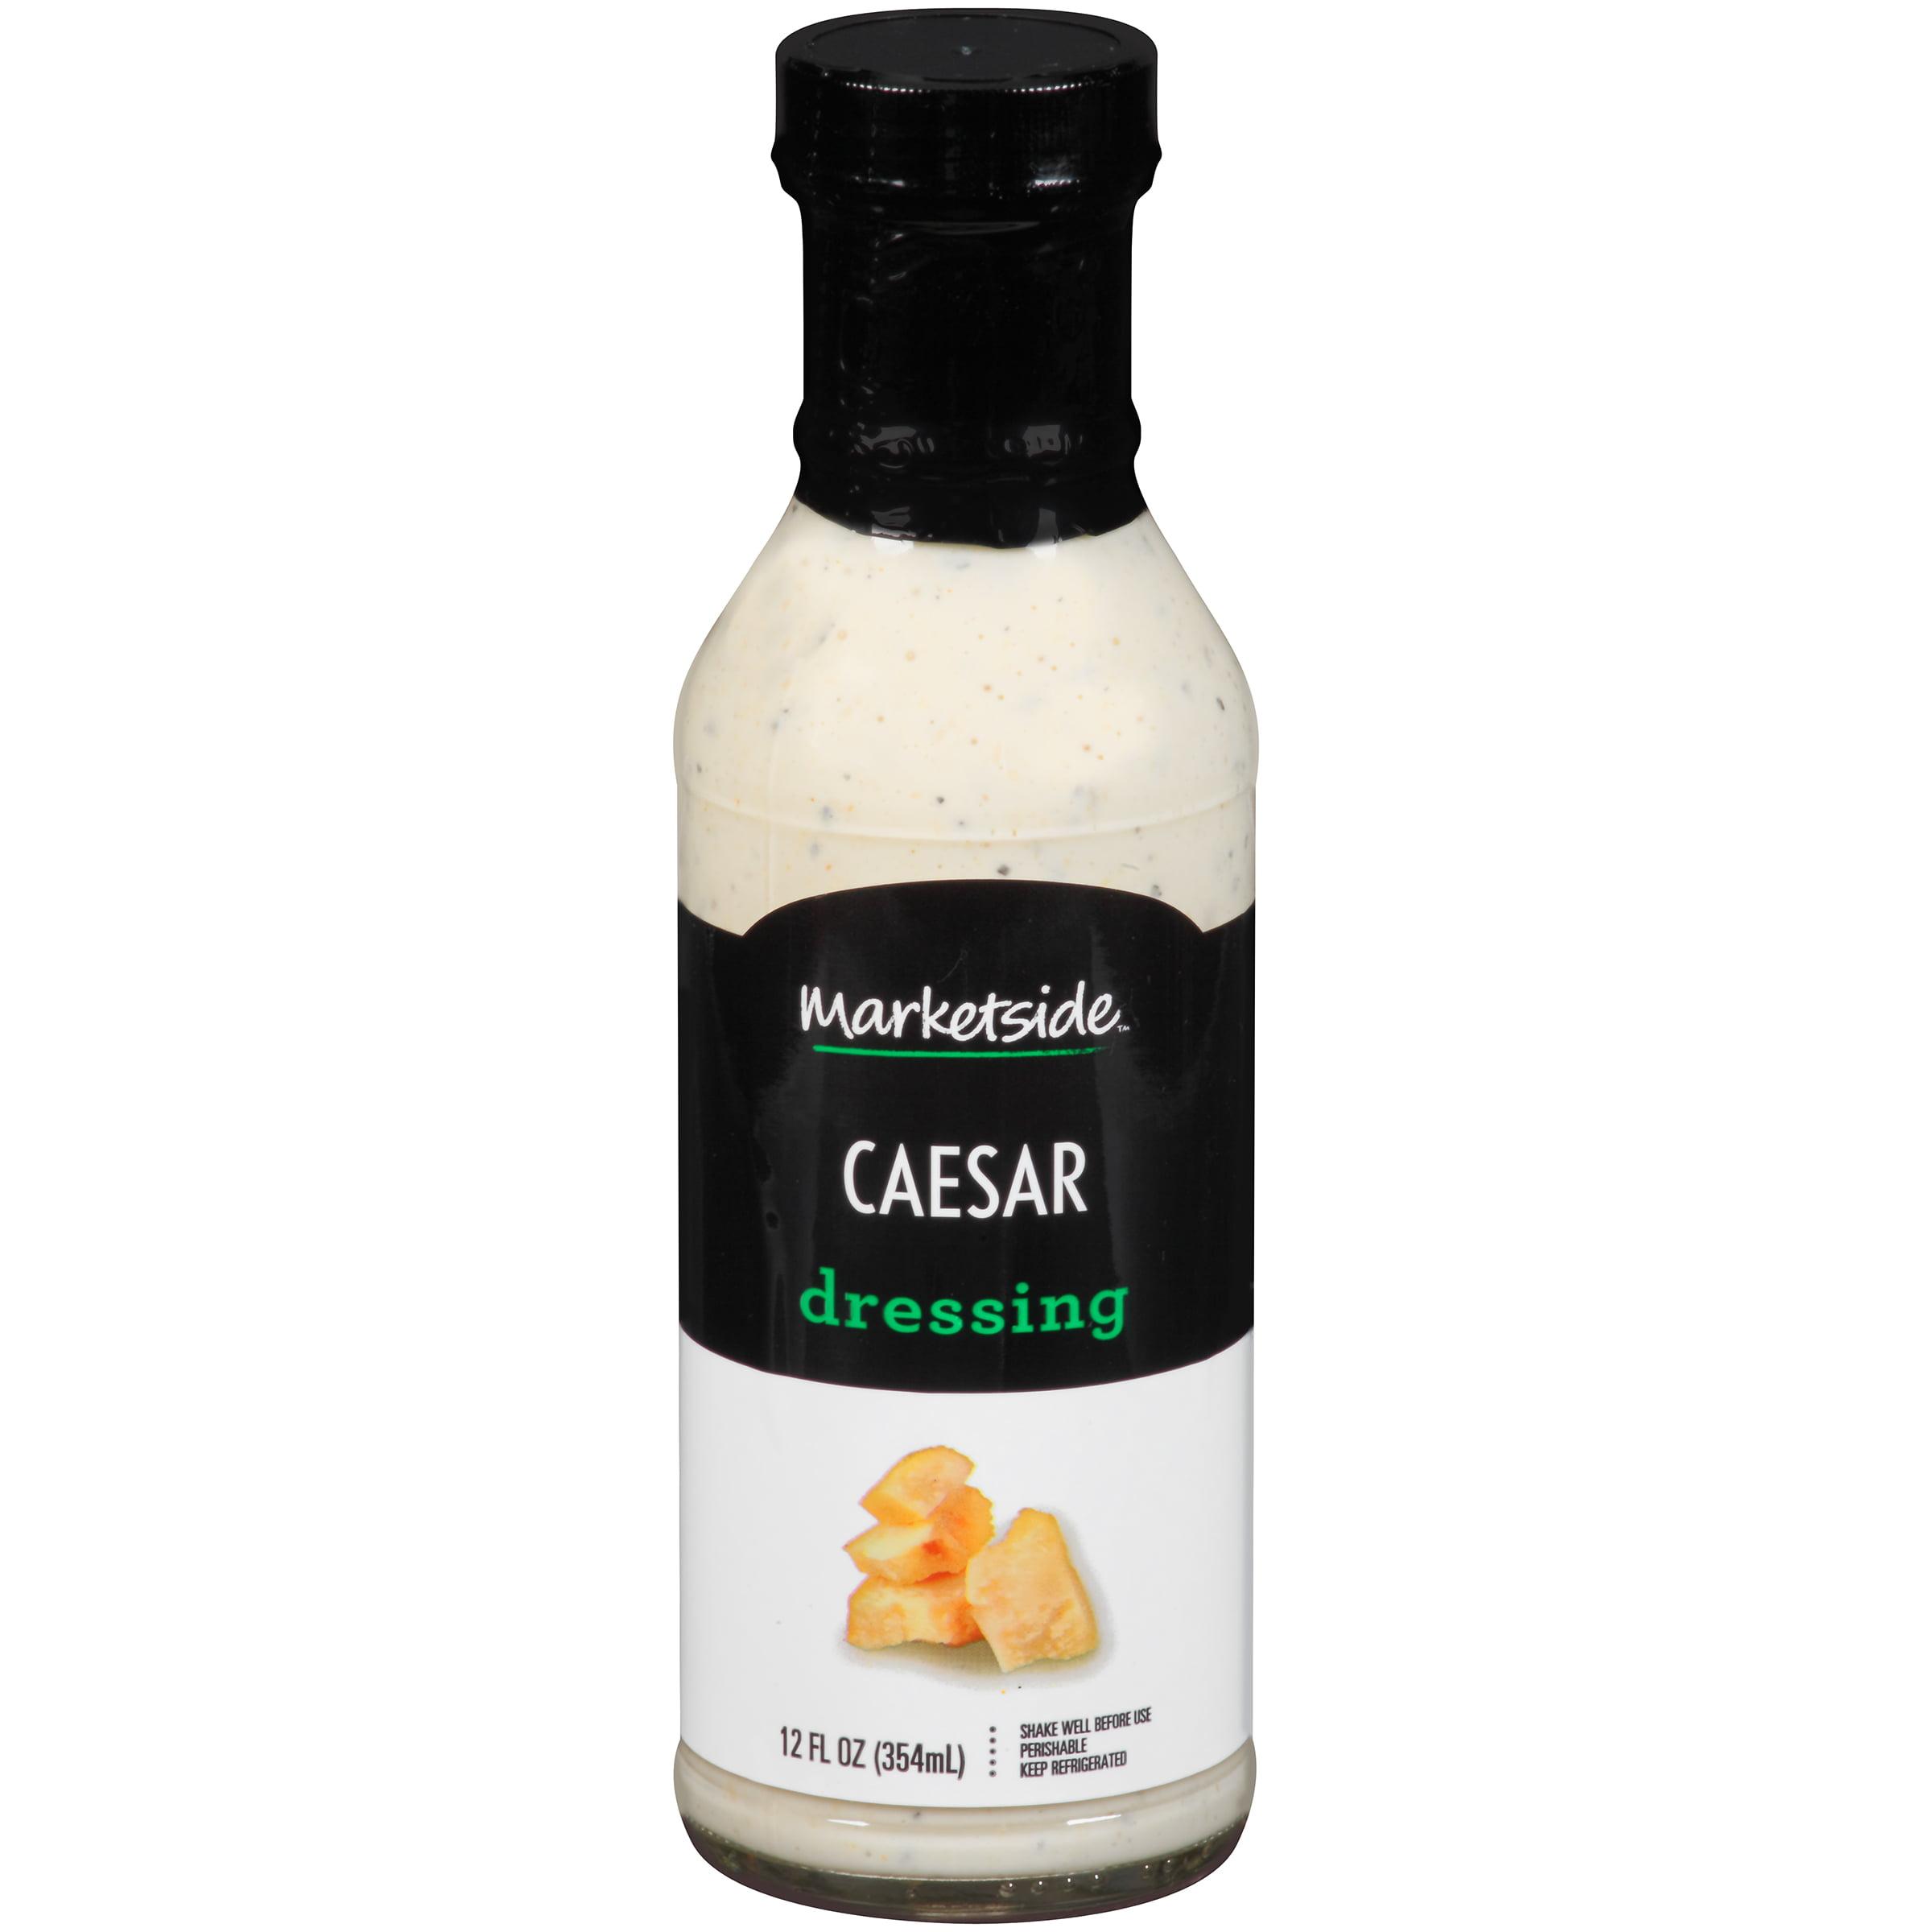 Marketside Caesar Dressing 12 fl oz Bottle